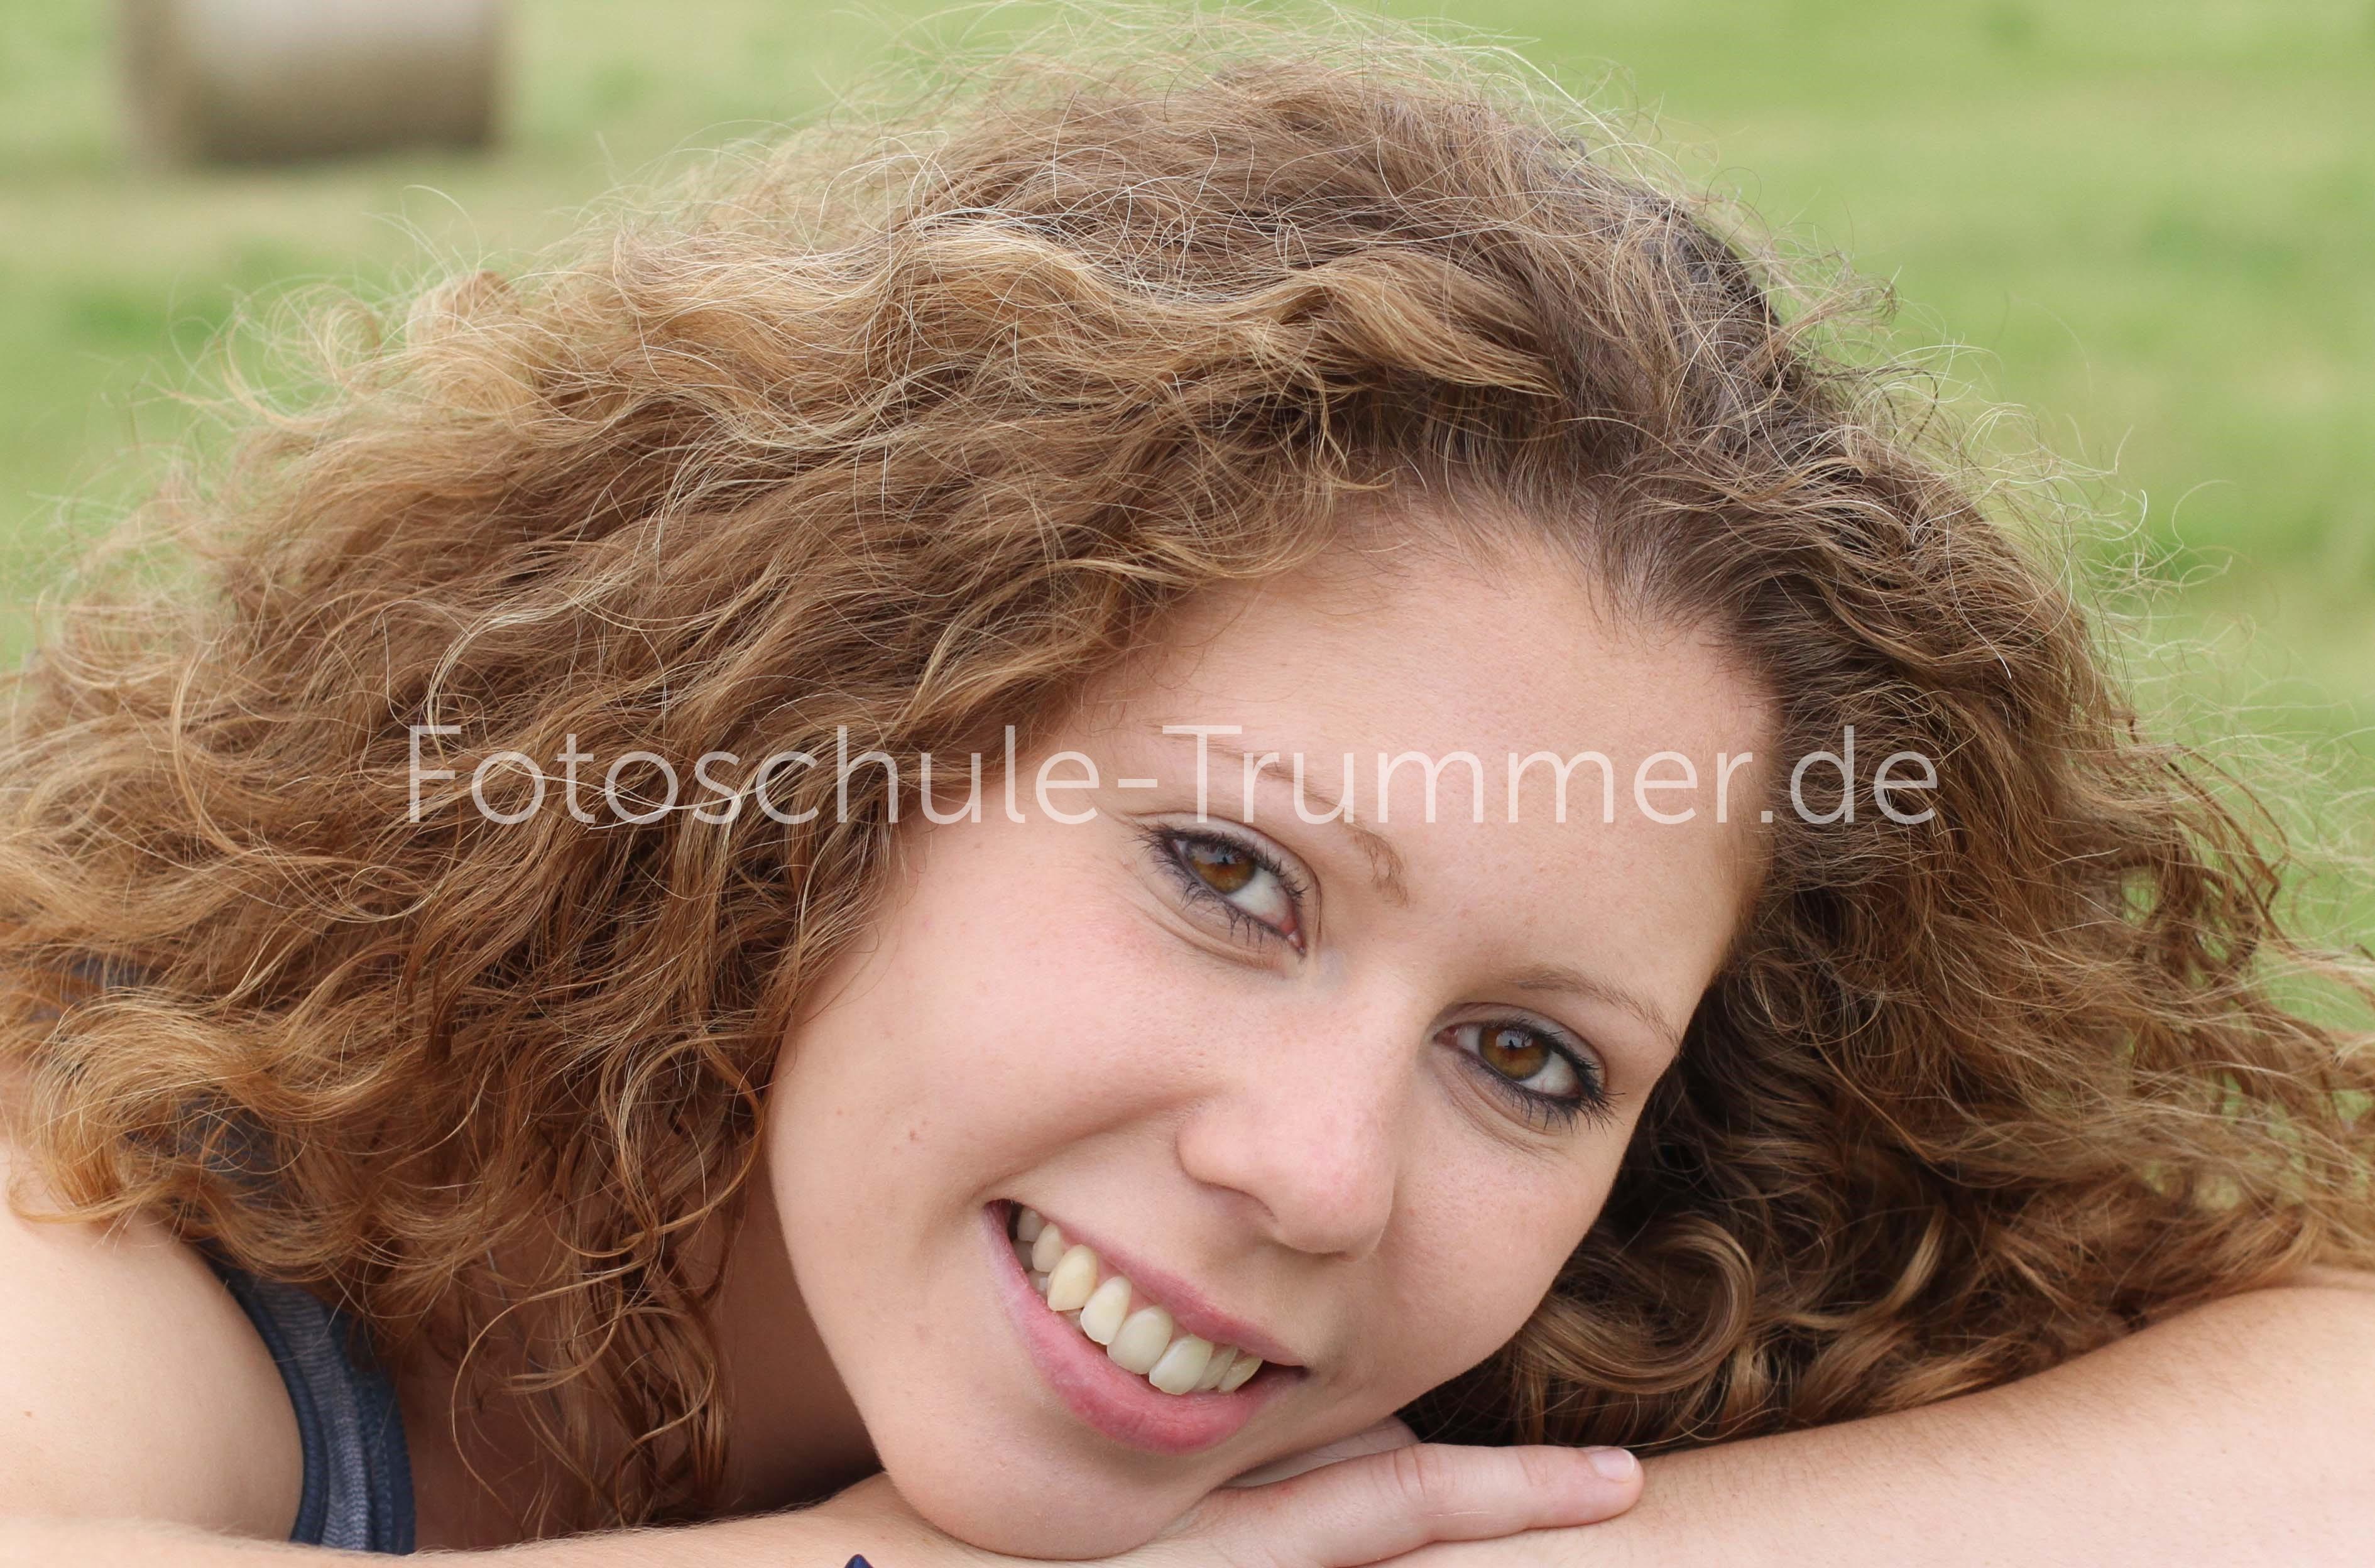 fotoschule trummer